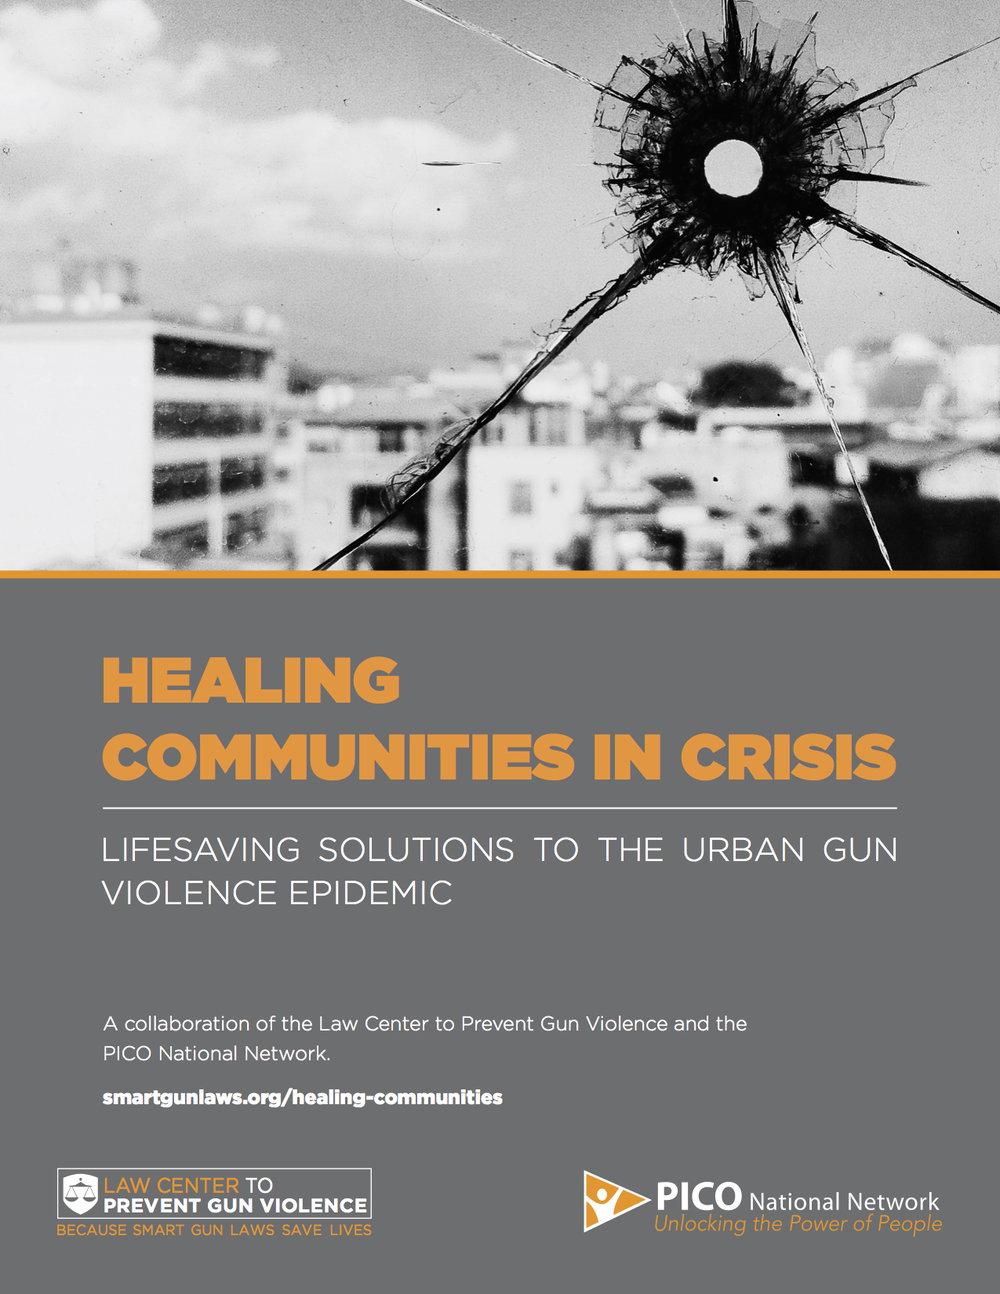 Healing-Communities-in-Crisis-URL.jpg